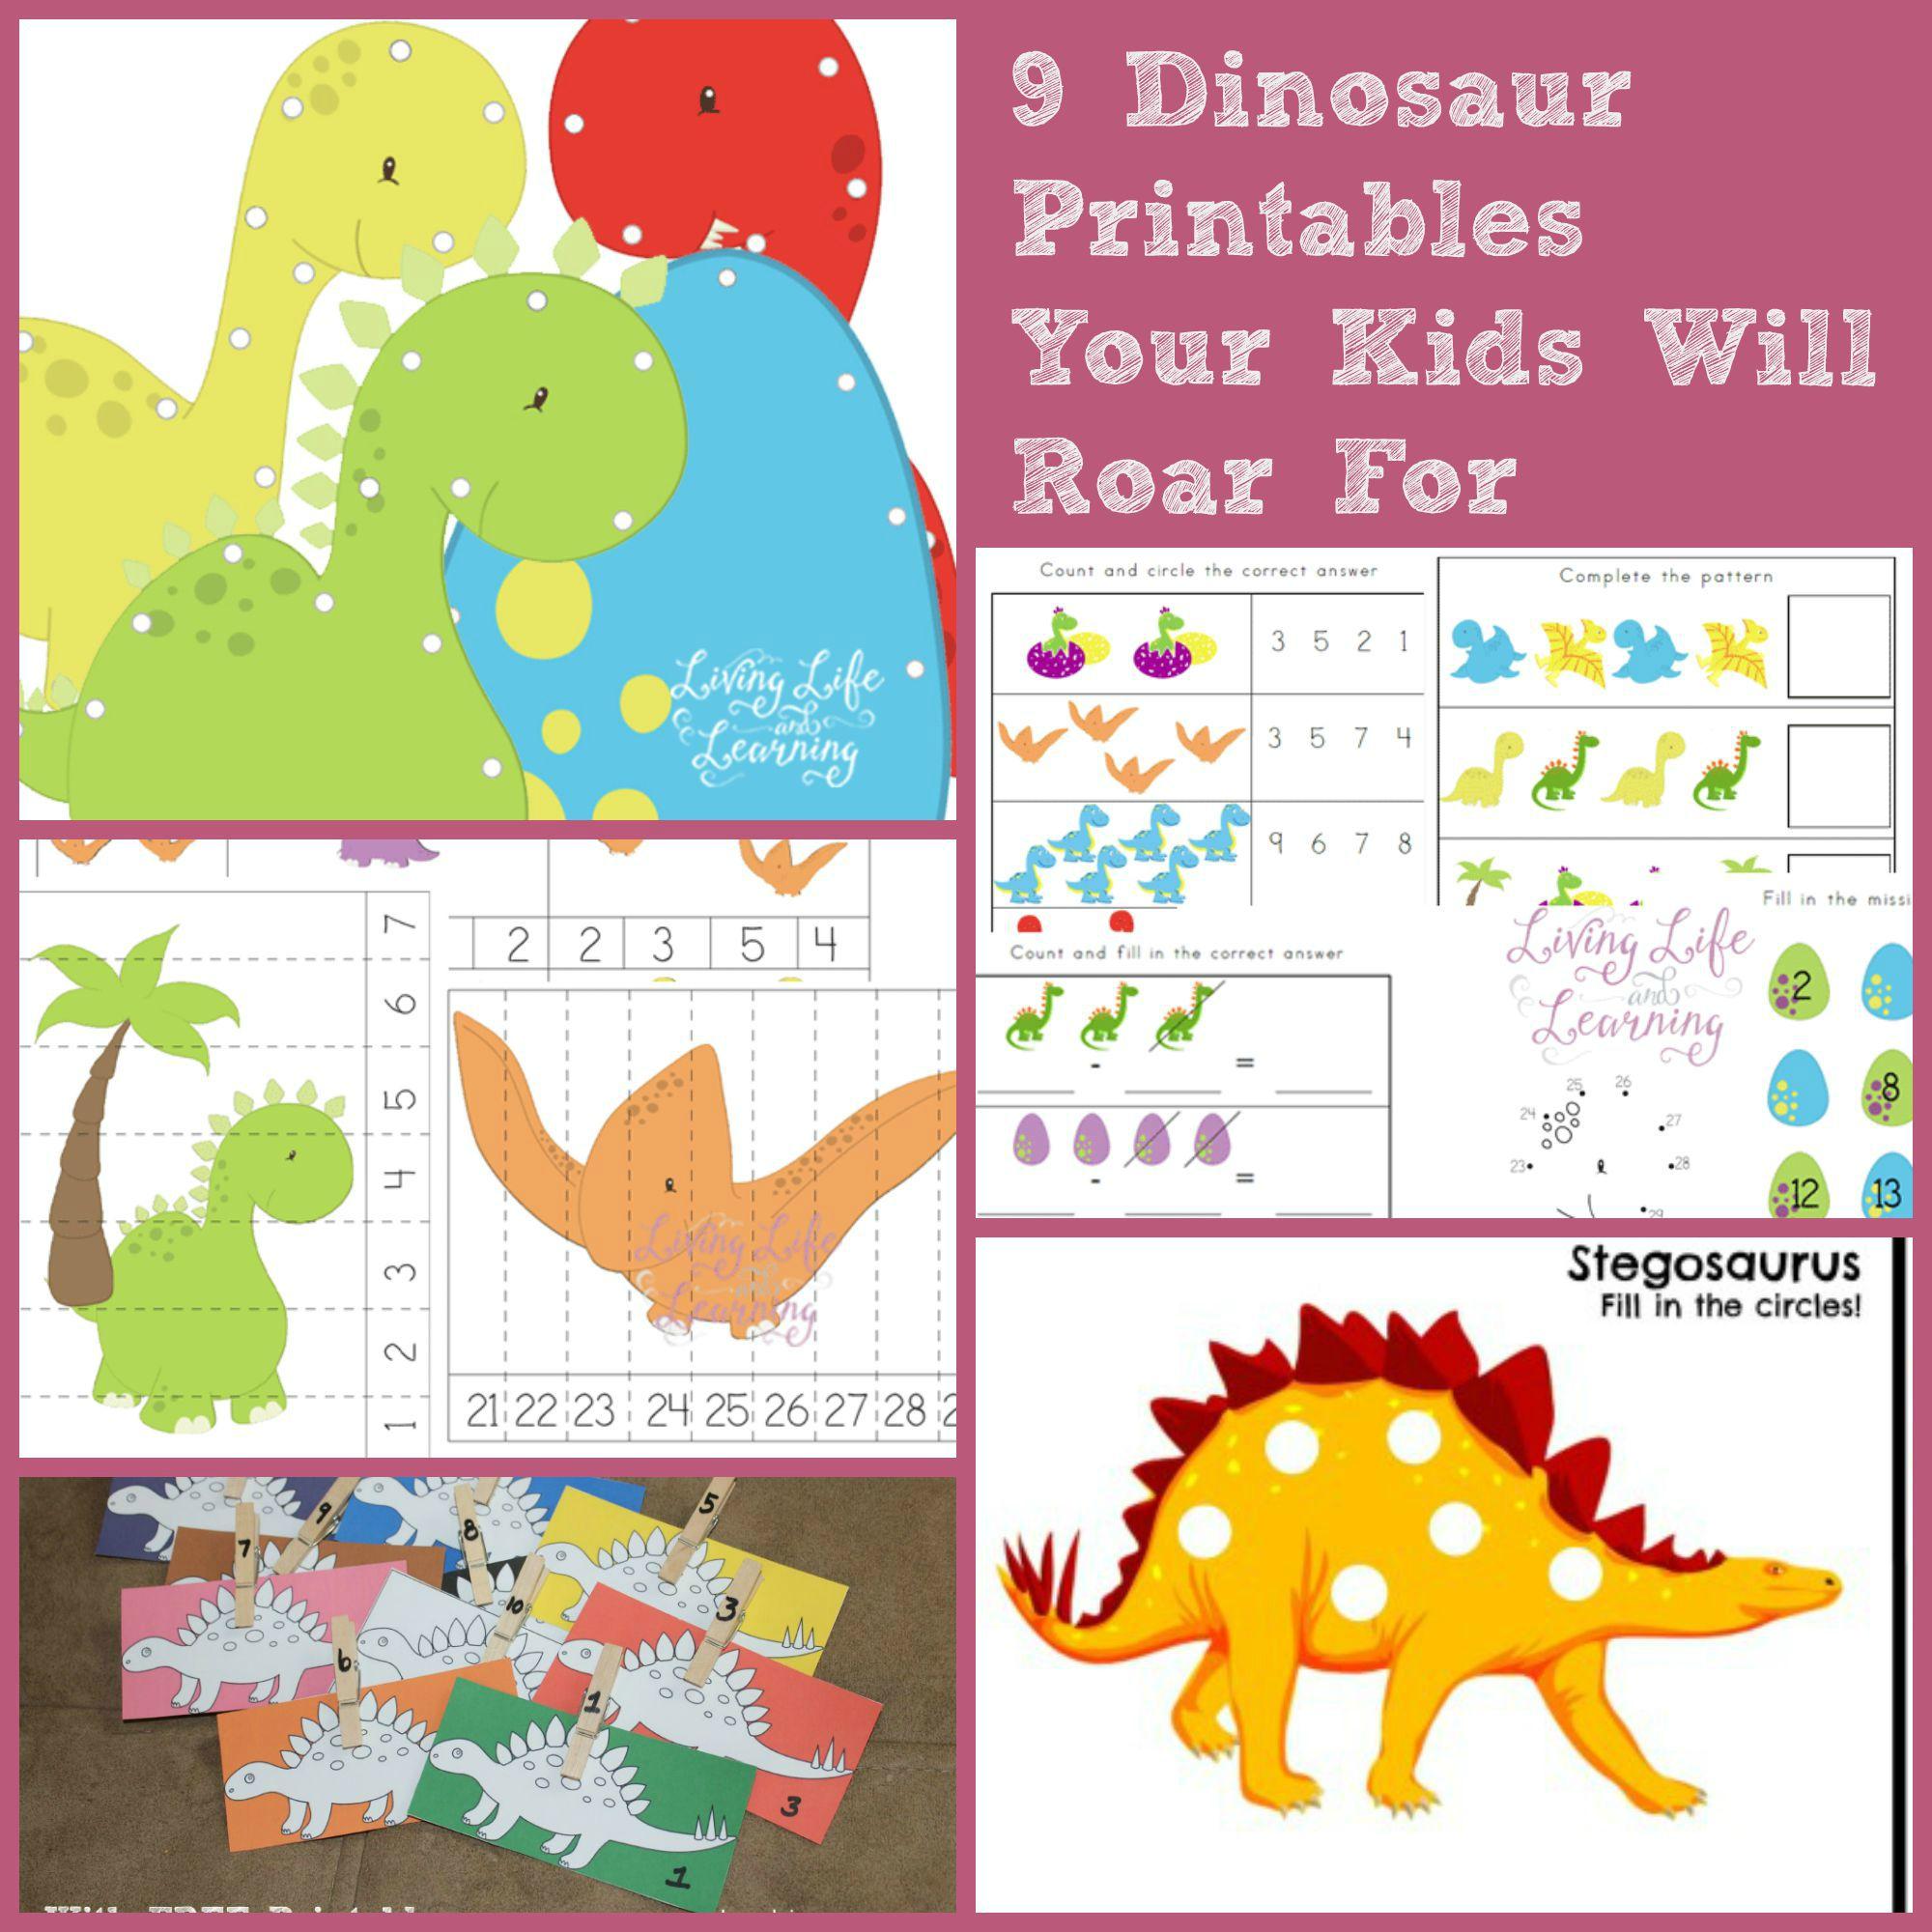 9 Dinosaur Printables To Roar For